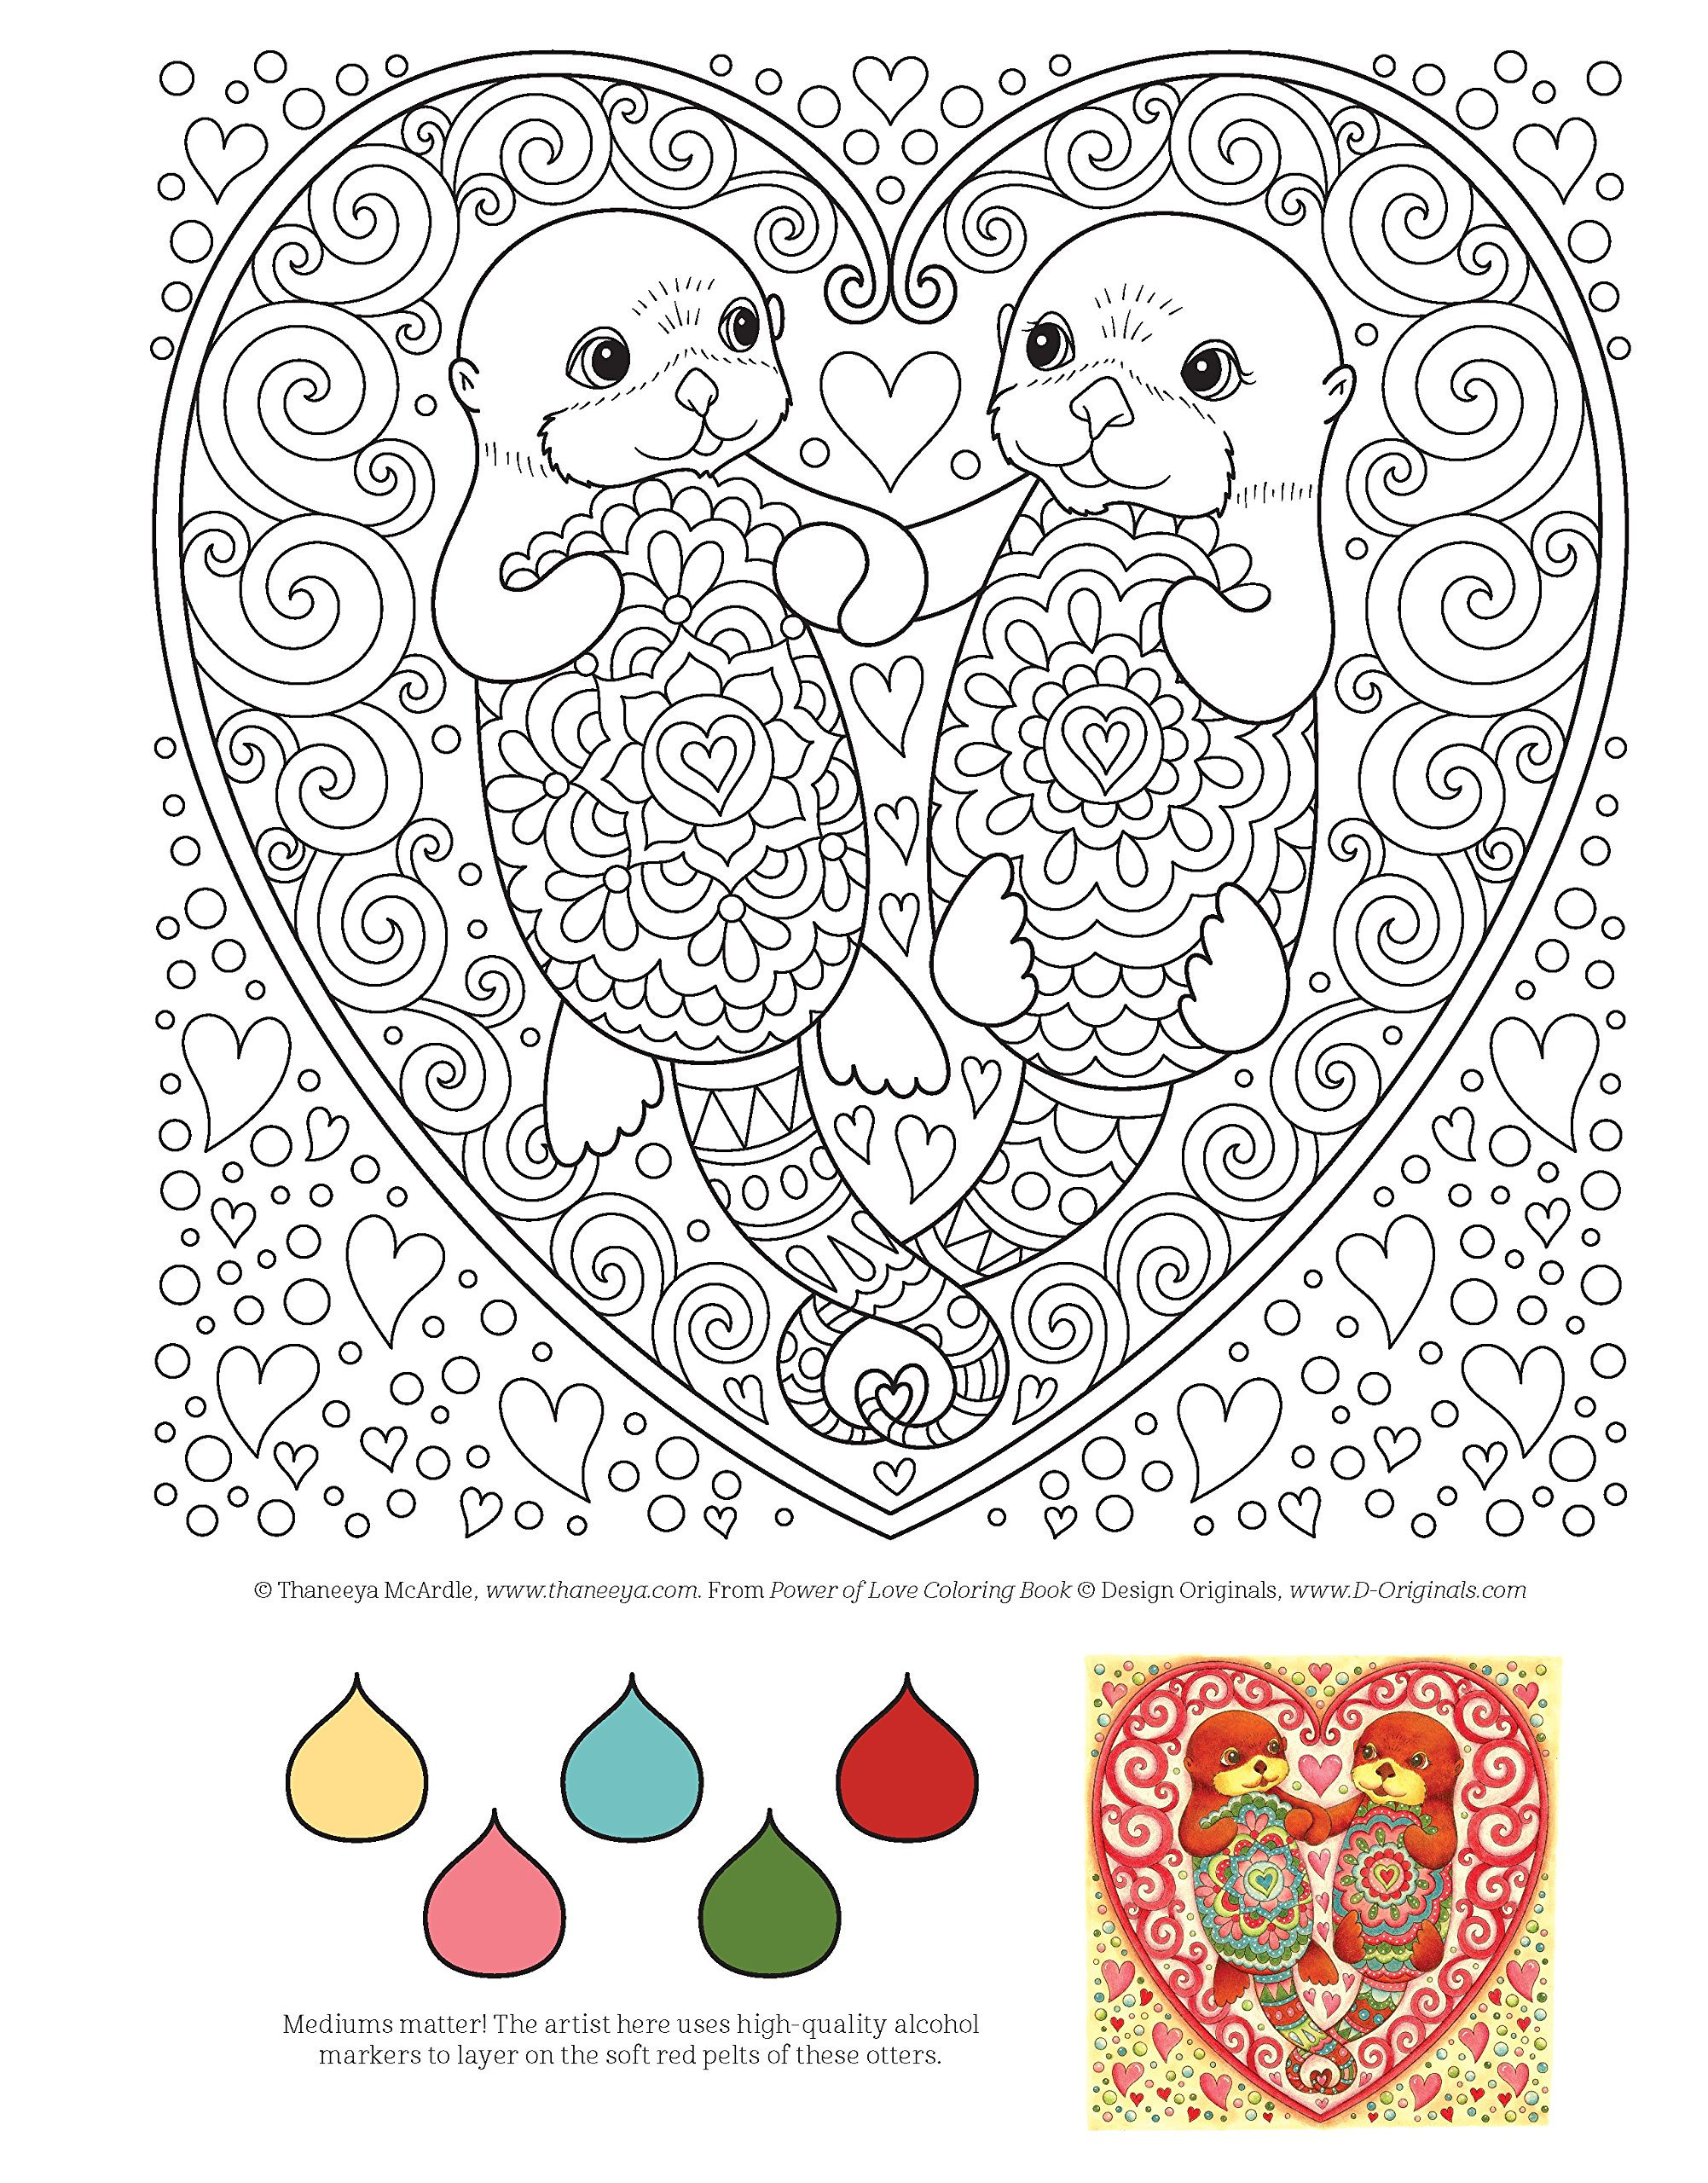 Amazon Power Of Love Coloring Book Is Fun Design Originals 32 Sweet Romantic Beginner Friendly Creative Art Activities From Thaneeya